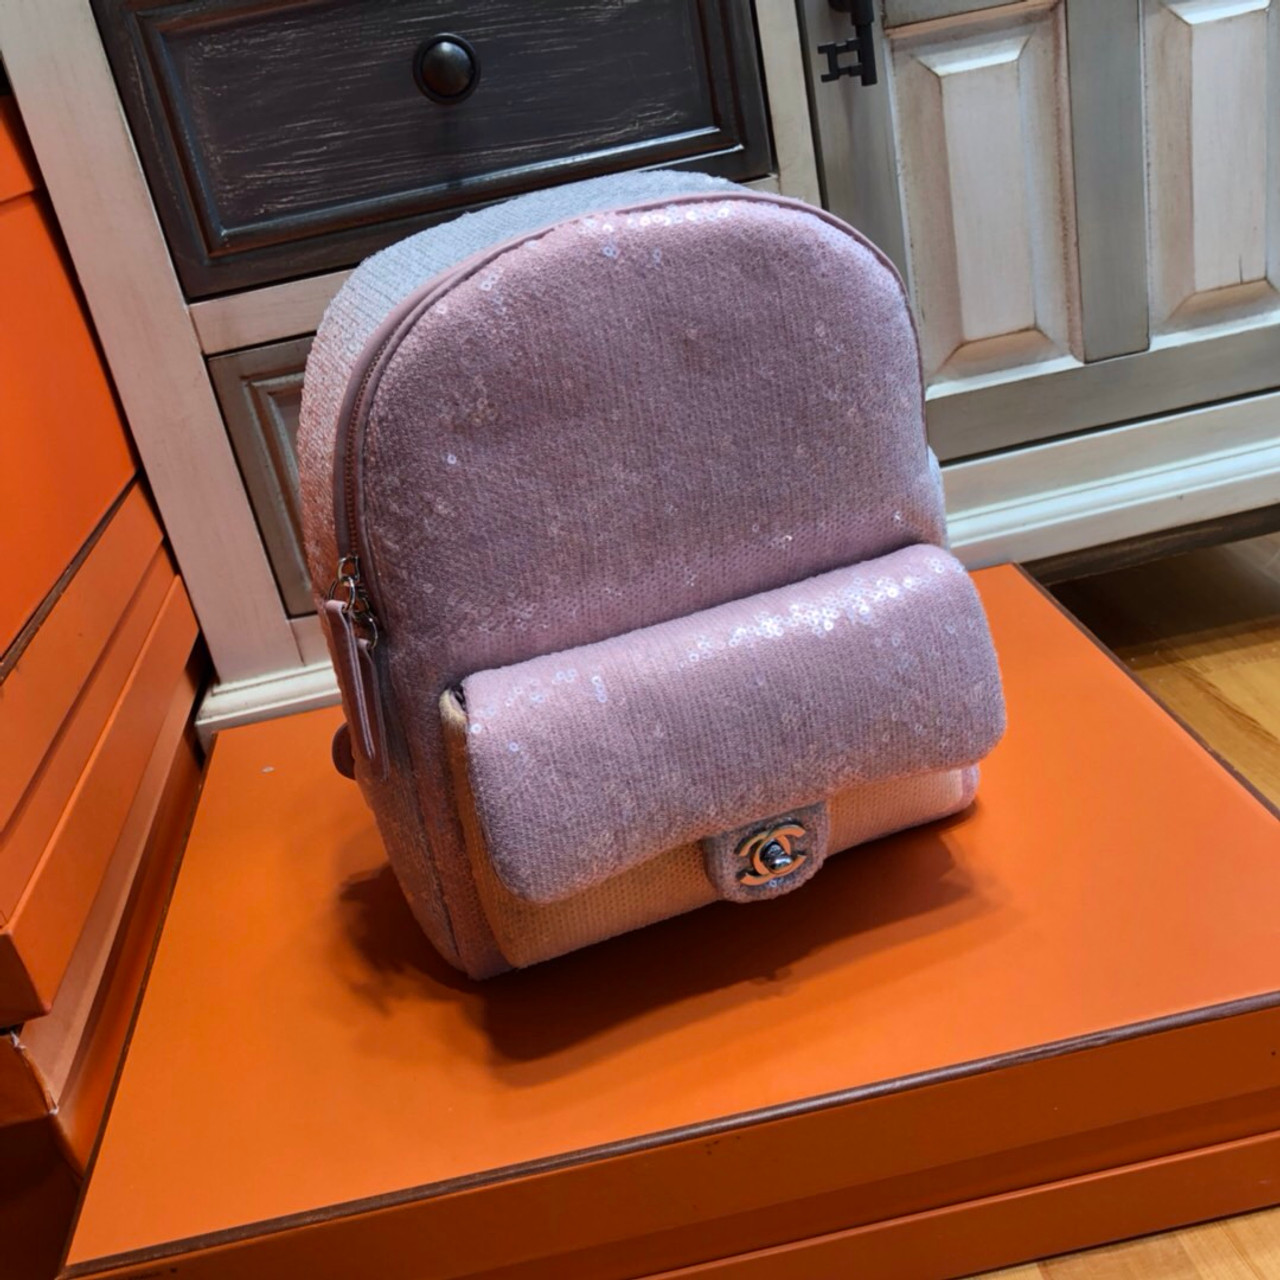 Chanel 2018 Sequins Backpack - Bella Vita Moda f0db3a13b9131